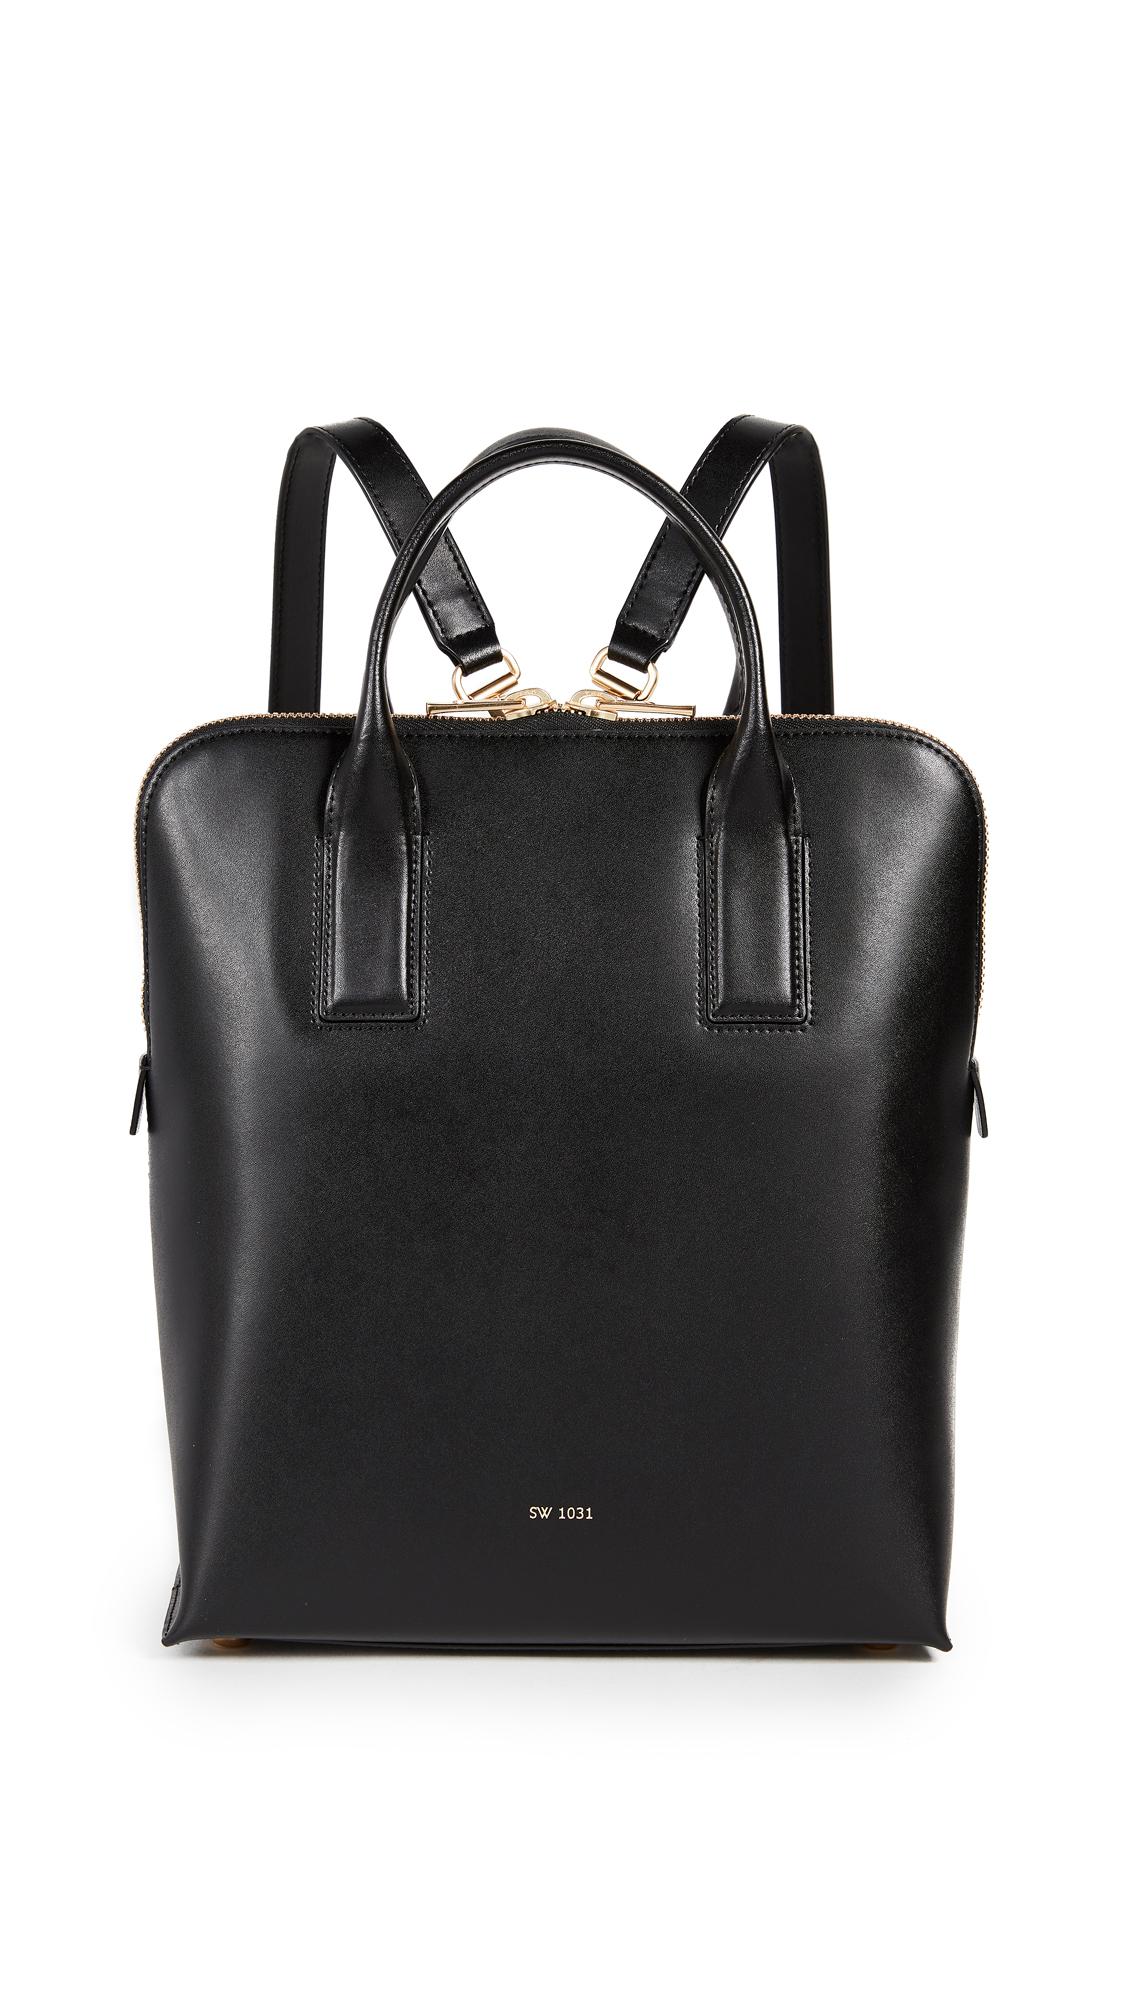 Sarah White Convertible Tablet Backpack - Black